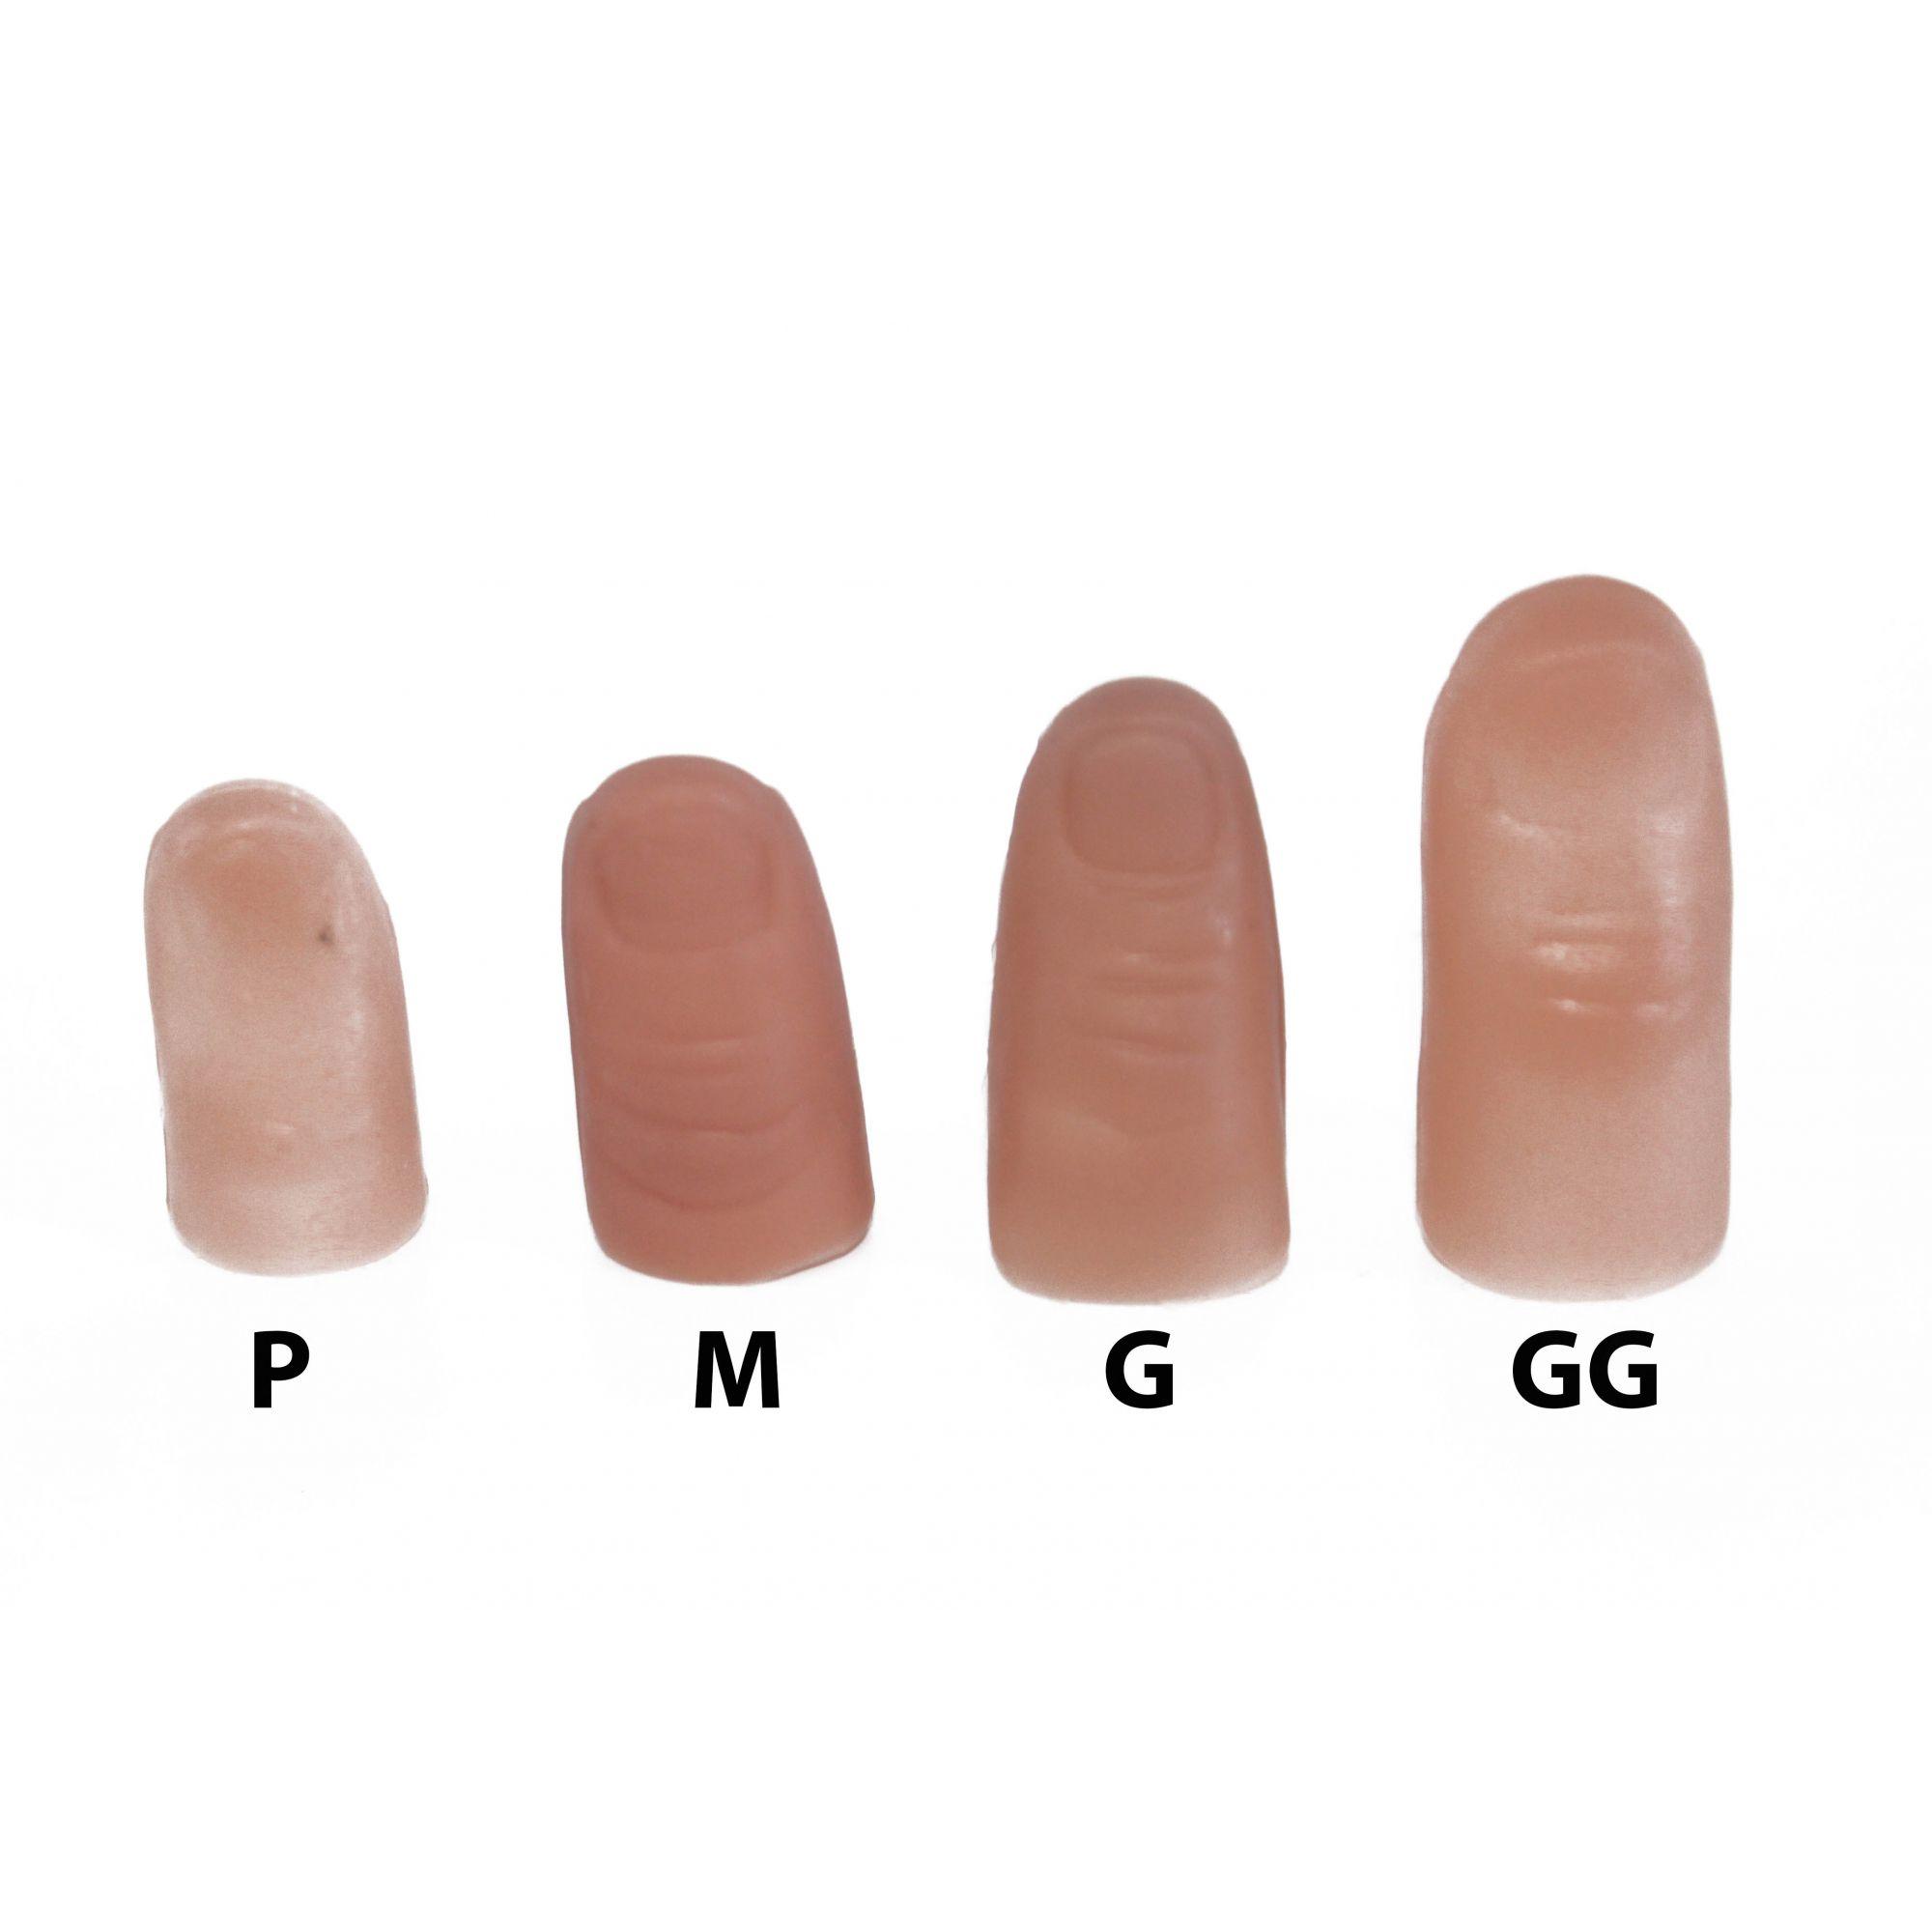 Kit de 4 Dedeiras tamanho P, M, G, GG D+